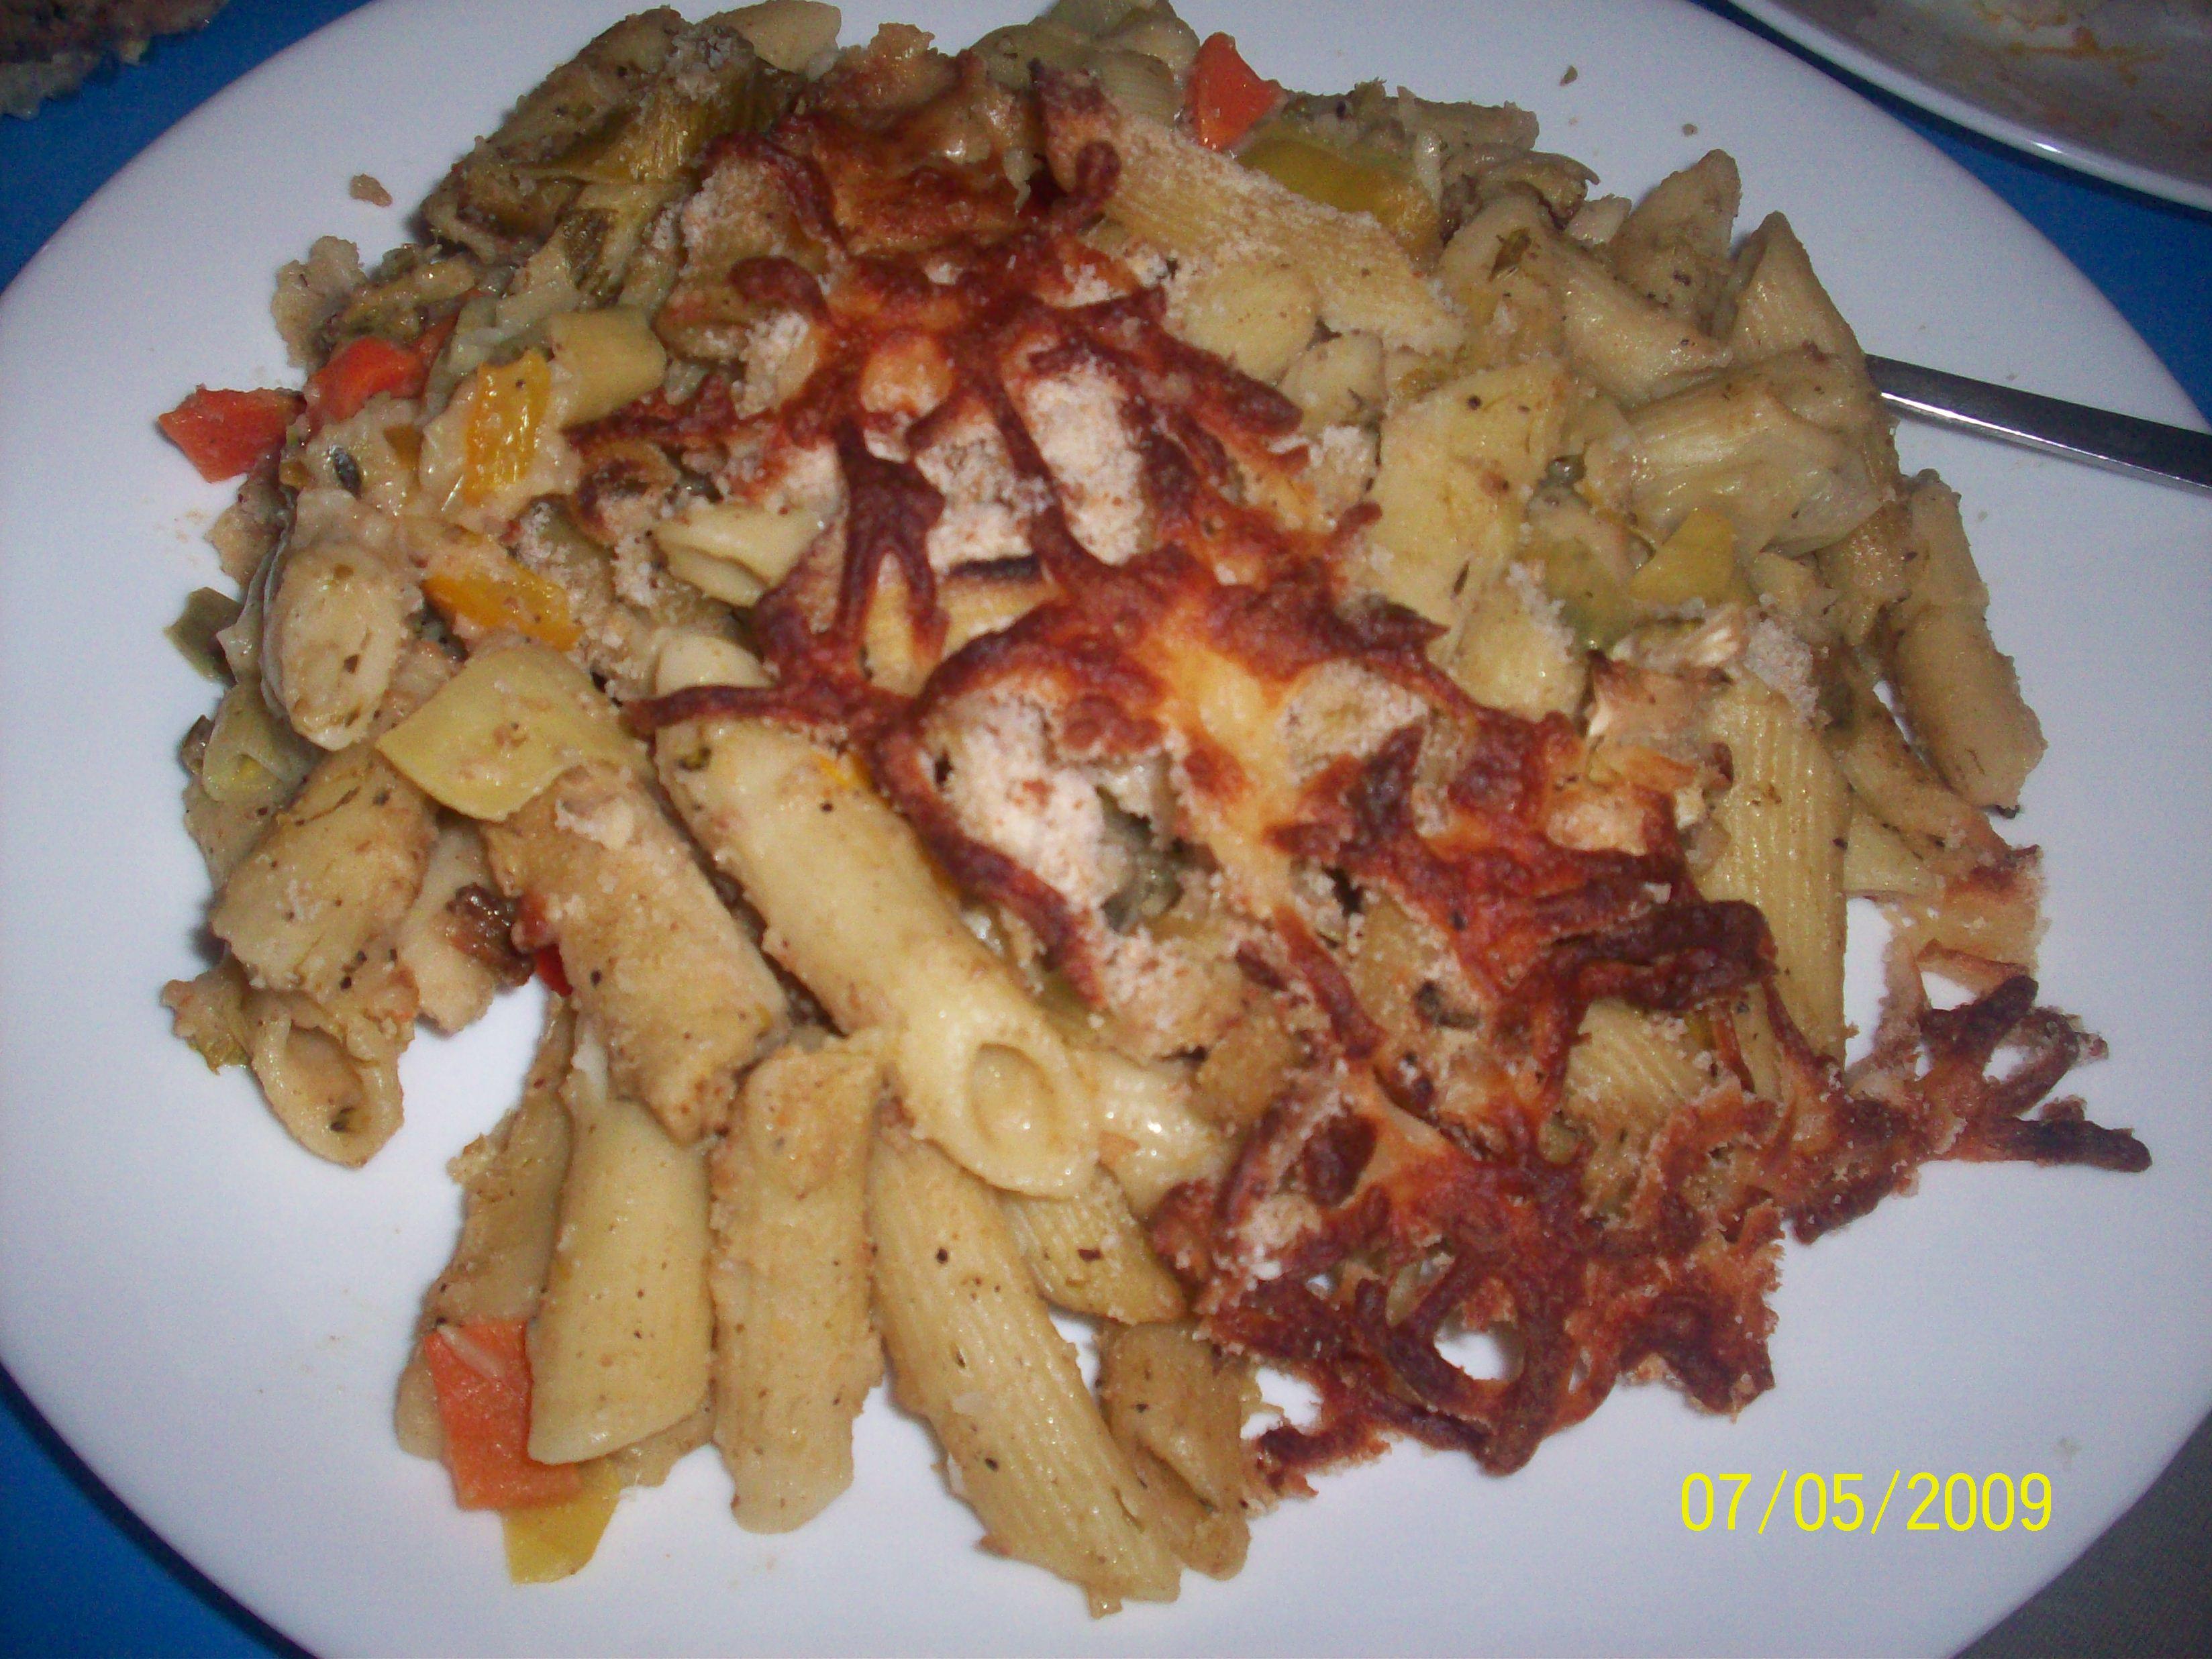 http://foodloader.net/cutie_2009-05-07_Veggie_Pasta.jpg